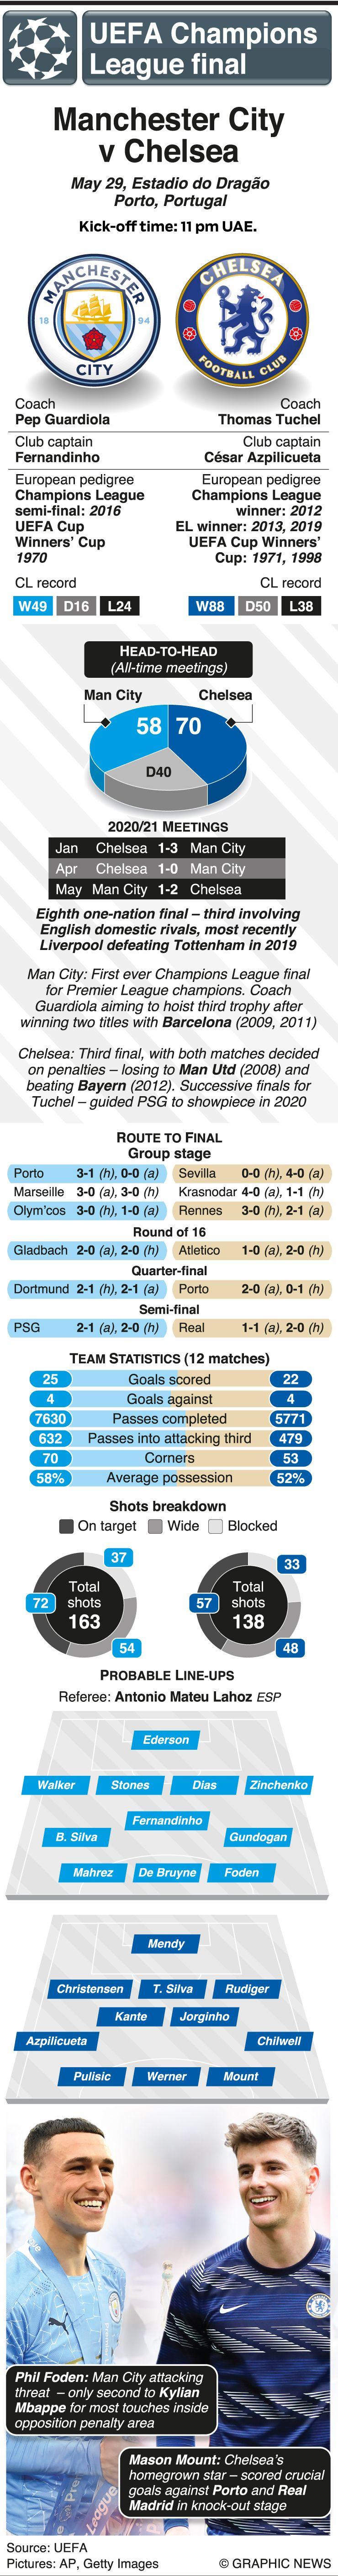 Champions League final graphic